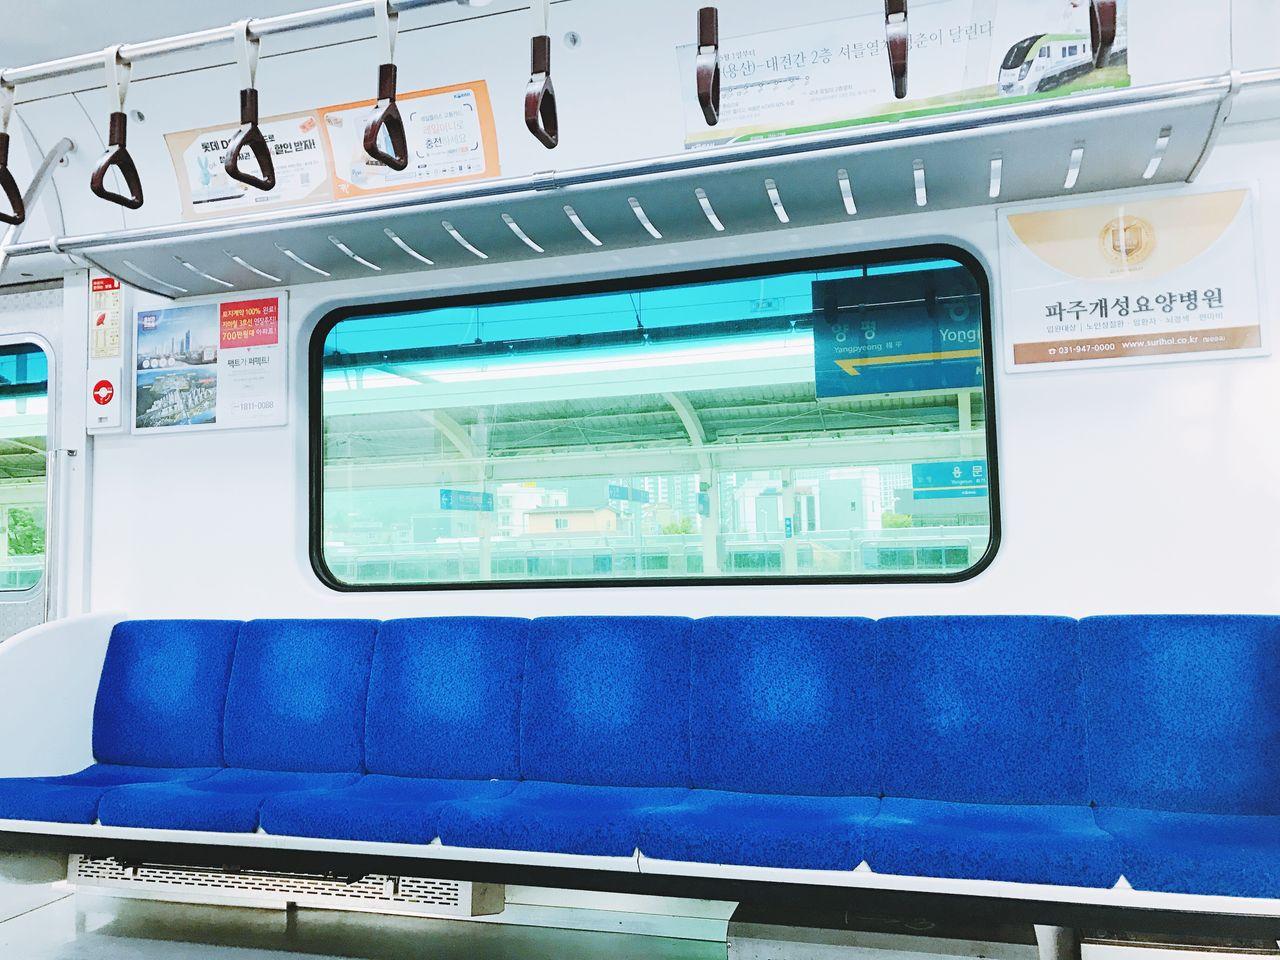 public transportation, train - vehicle, mode of transport, transportation, window, no people, communication, text, vehicle seat, blue, day, indoors